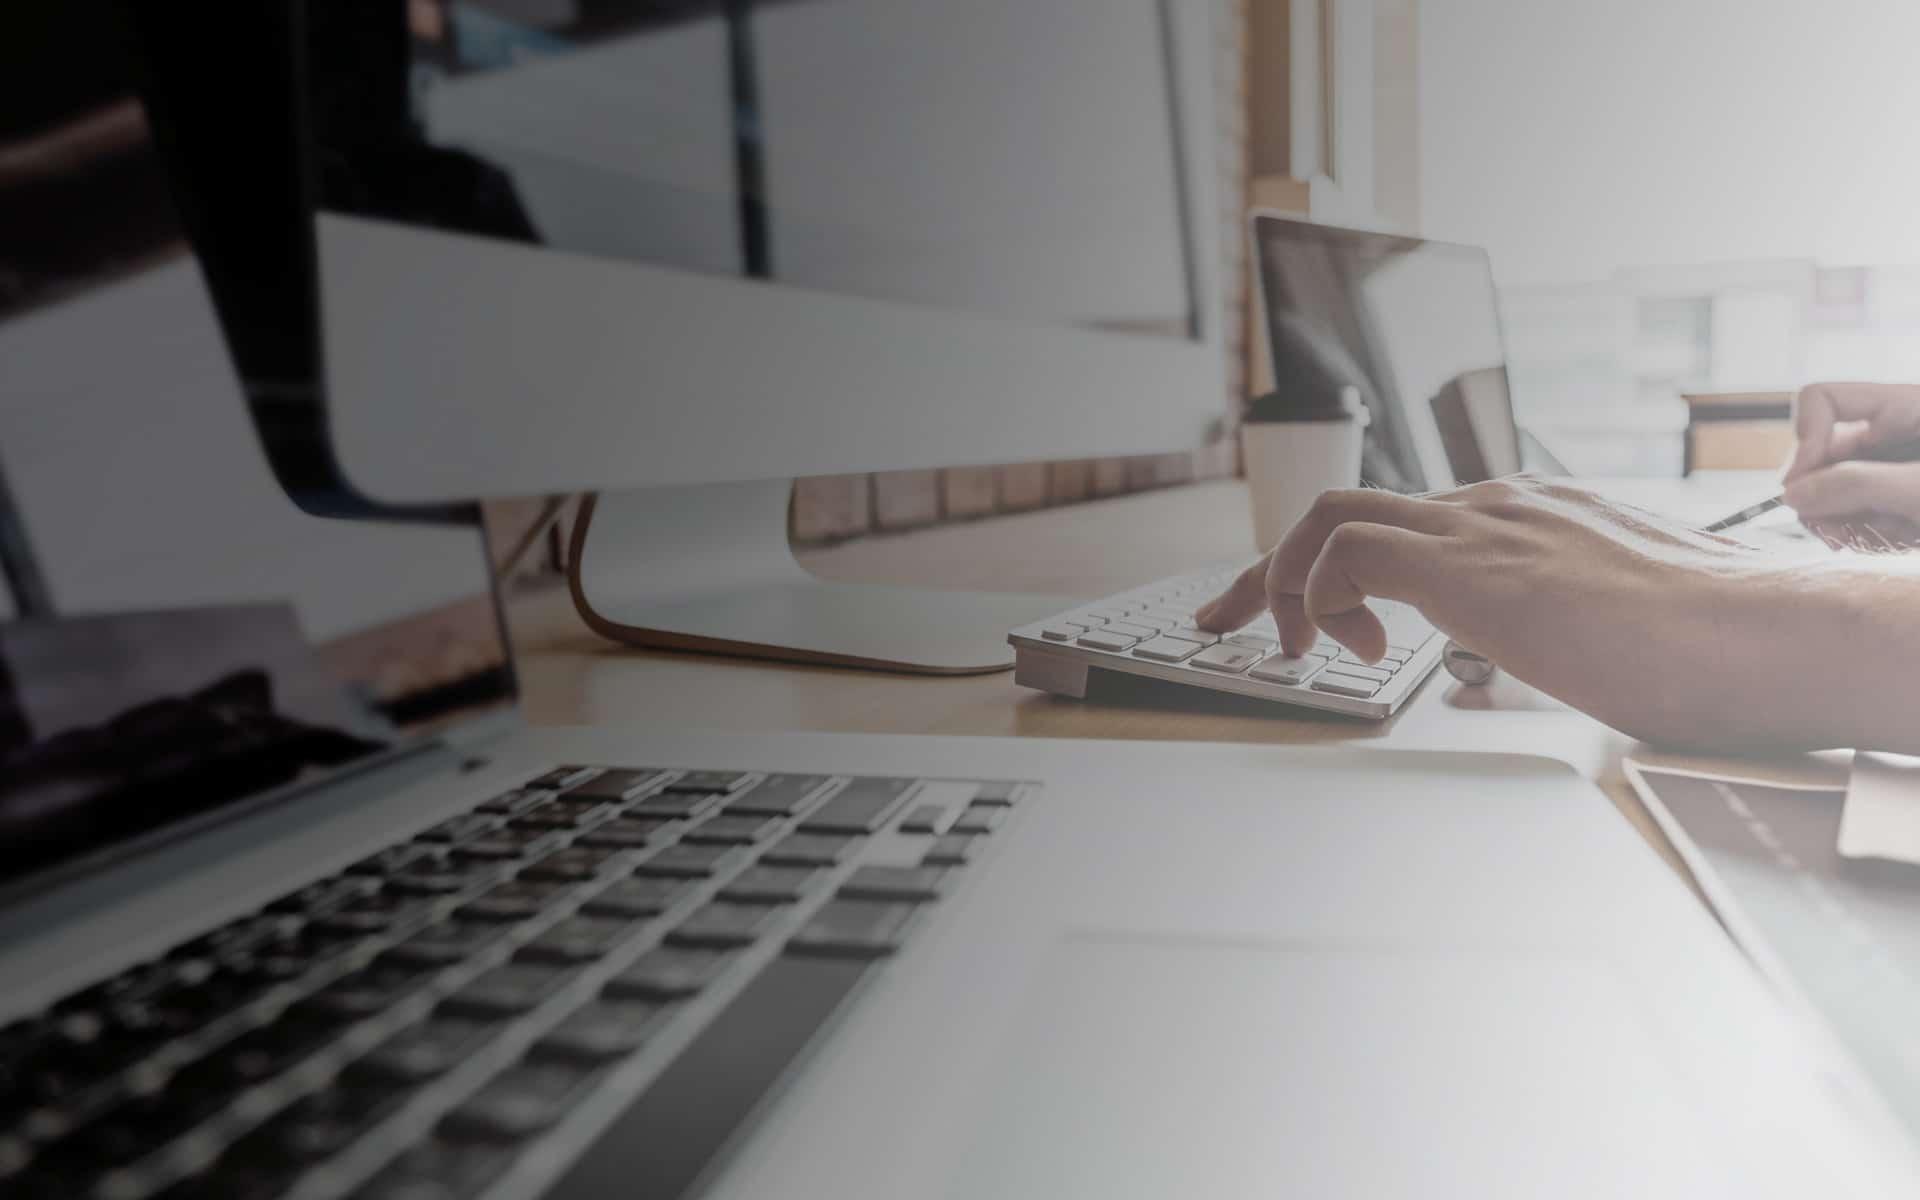 web designer freelance milano napoli digital dew